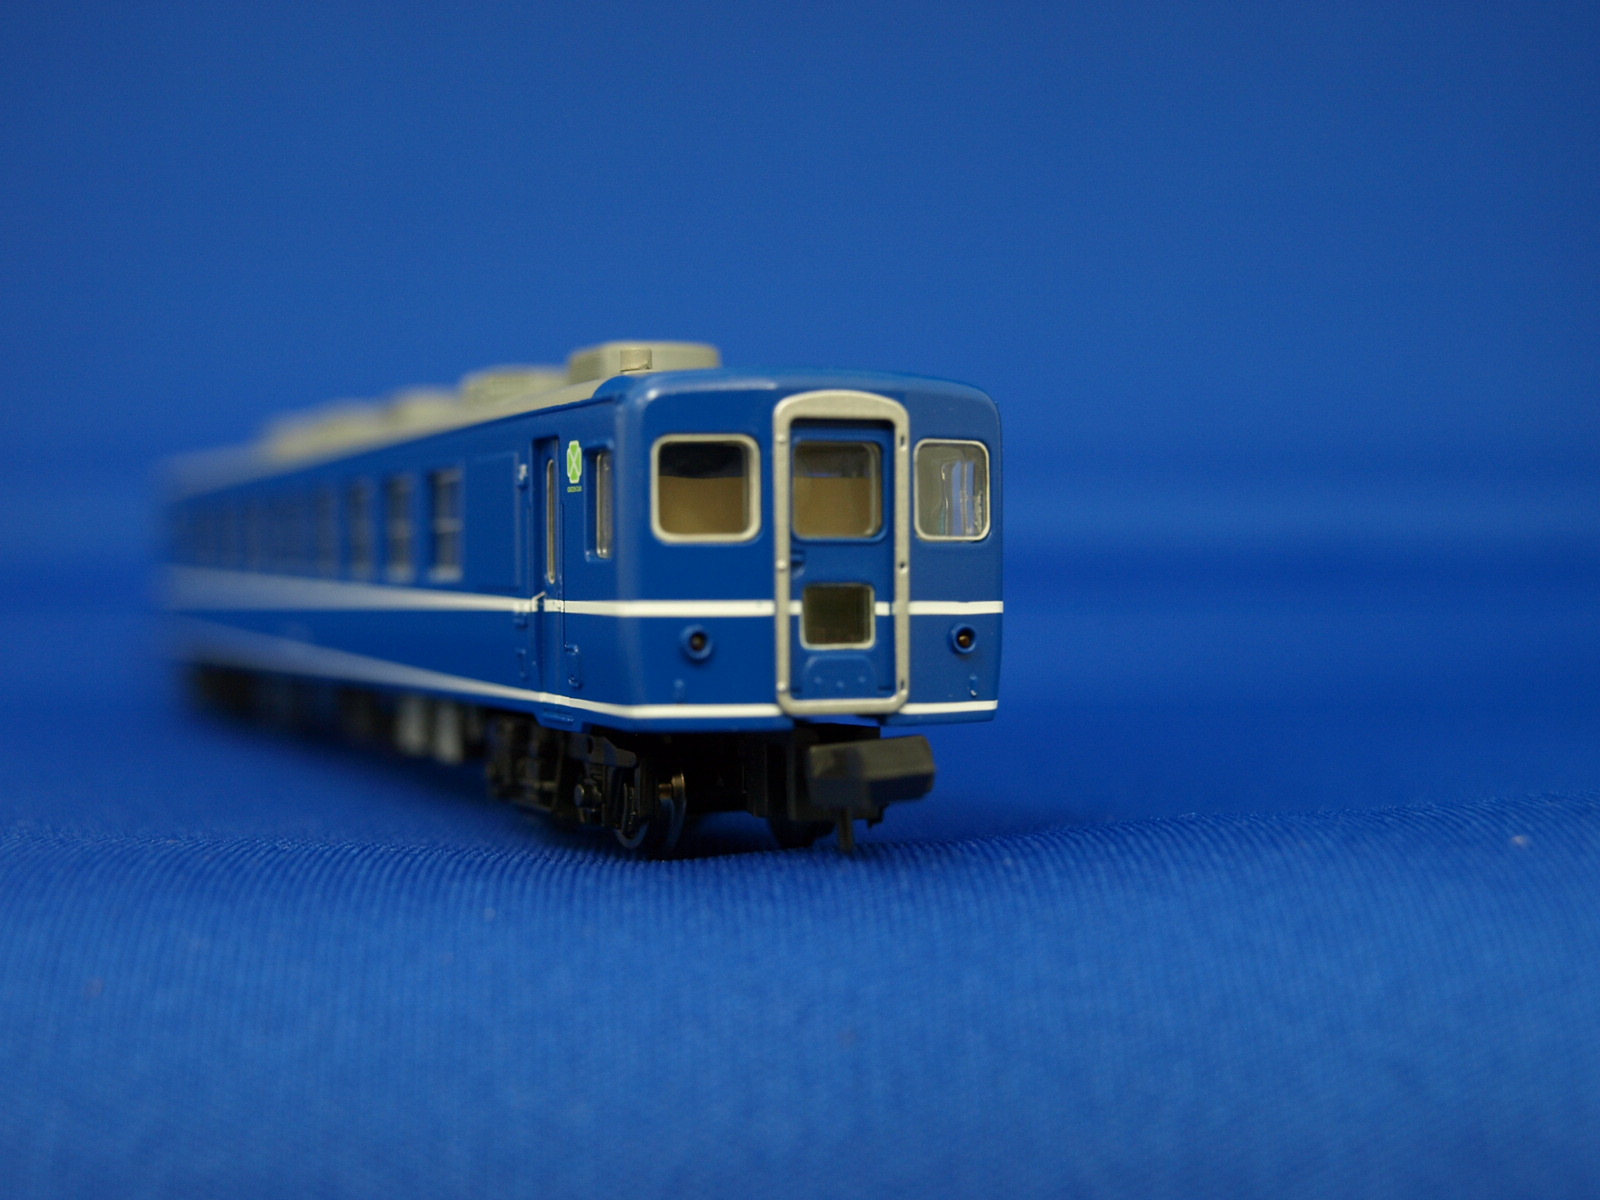 Nゲージ マイクロエース A1858 12系・お座敷・カヌ座+サロン佐渡(登場時)7両セット